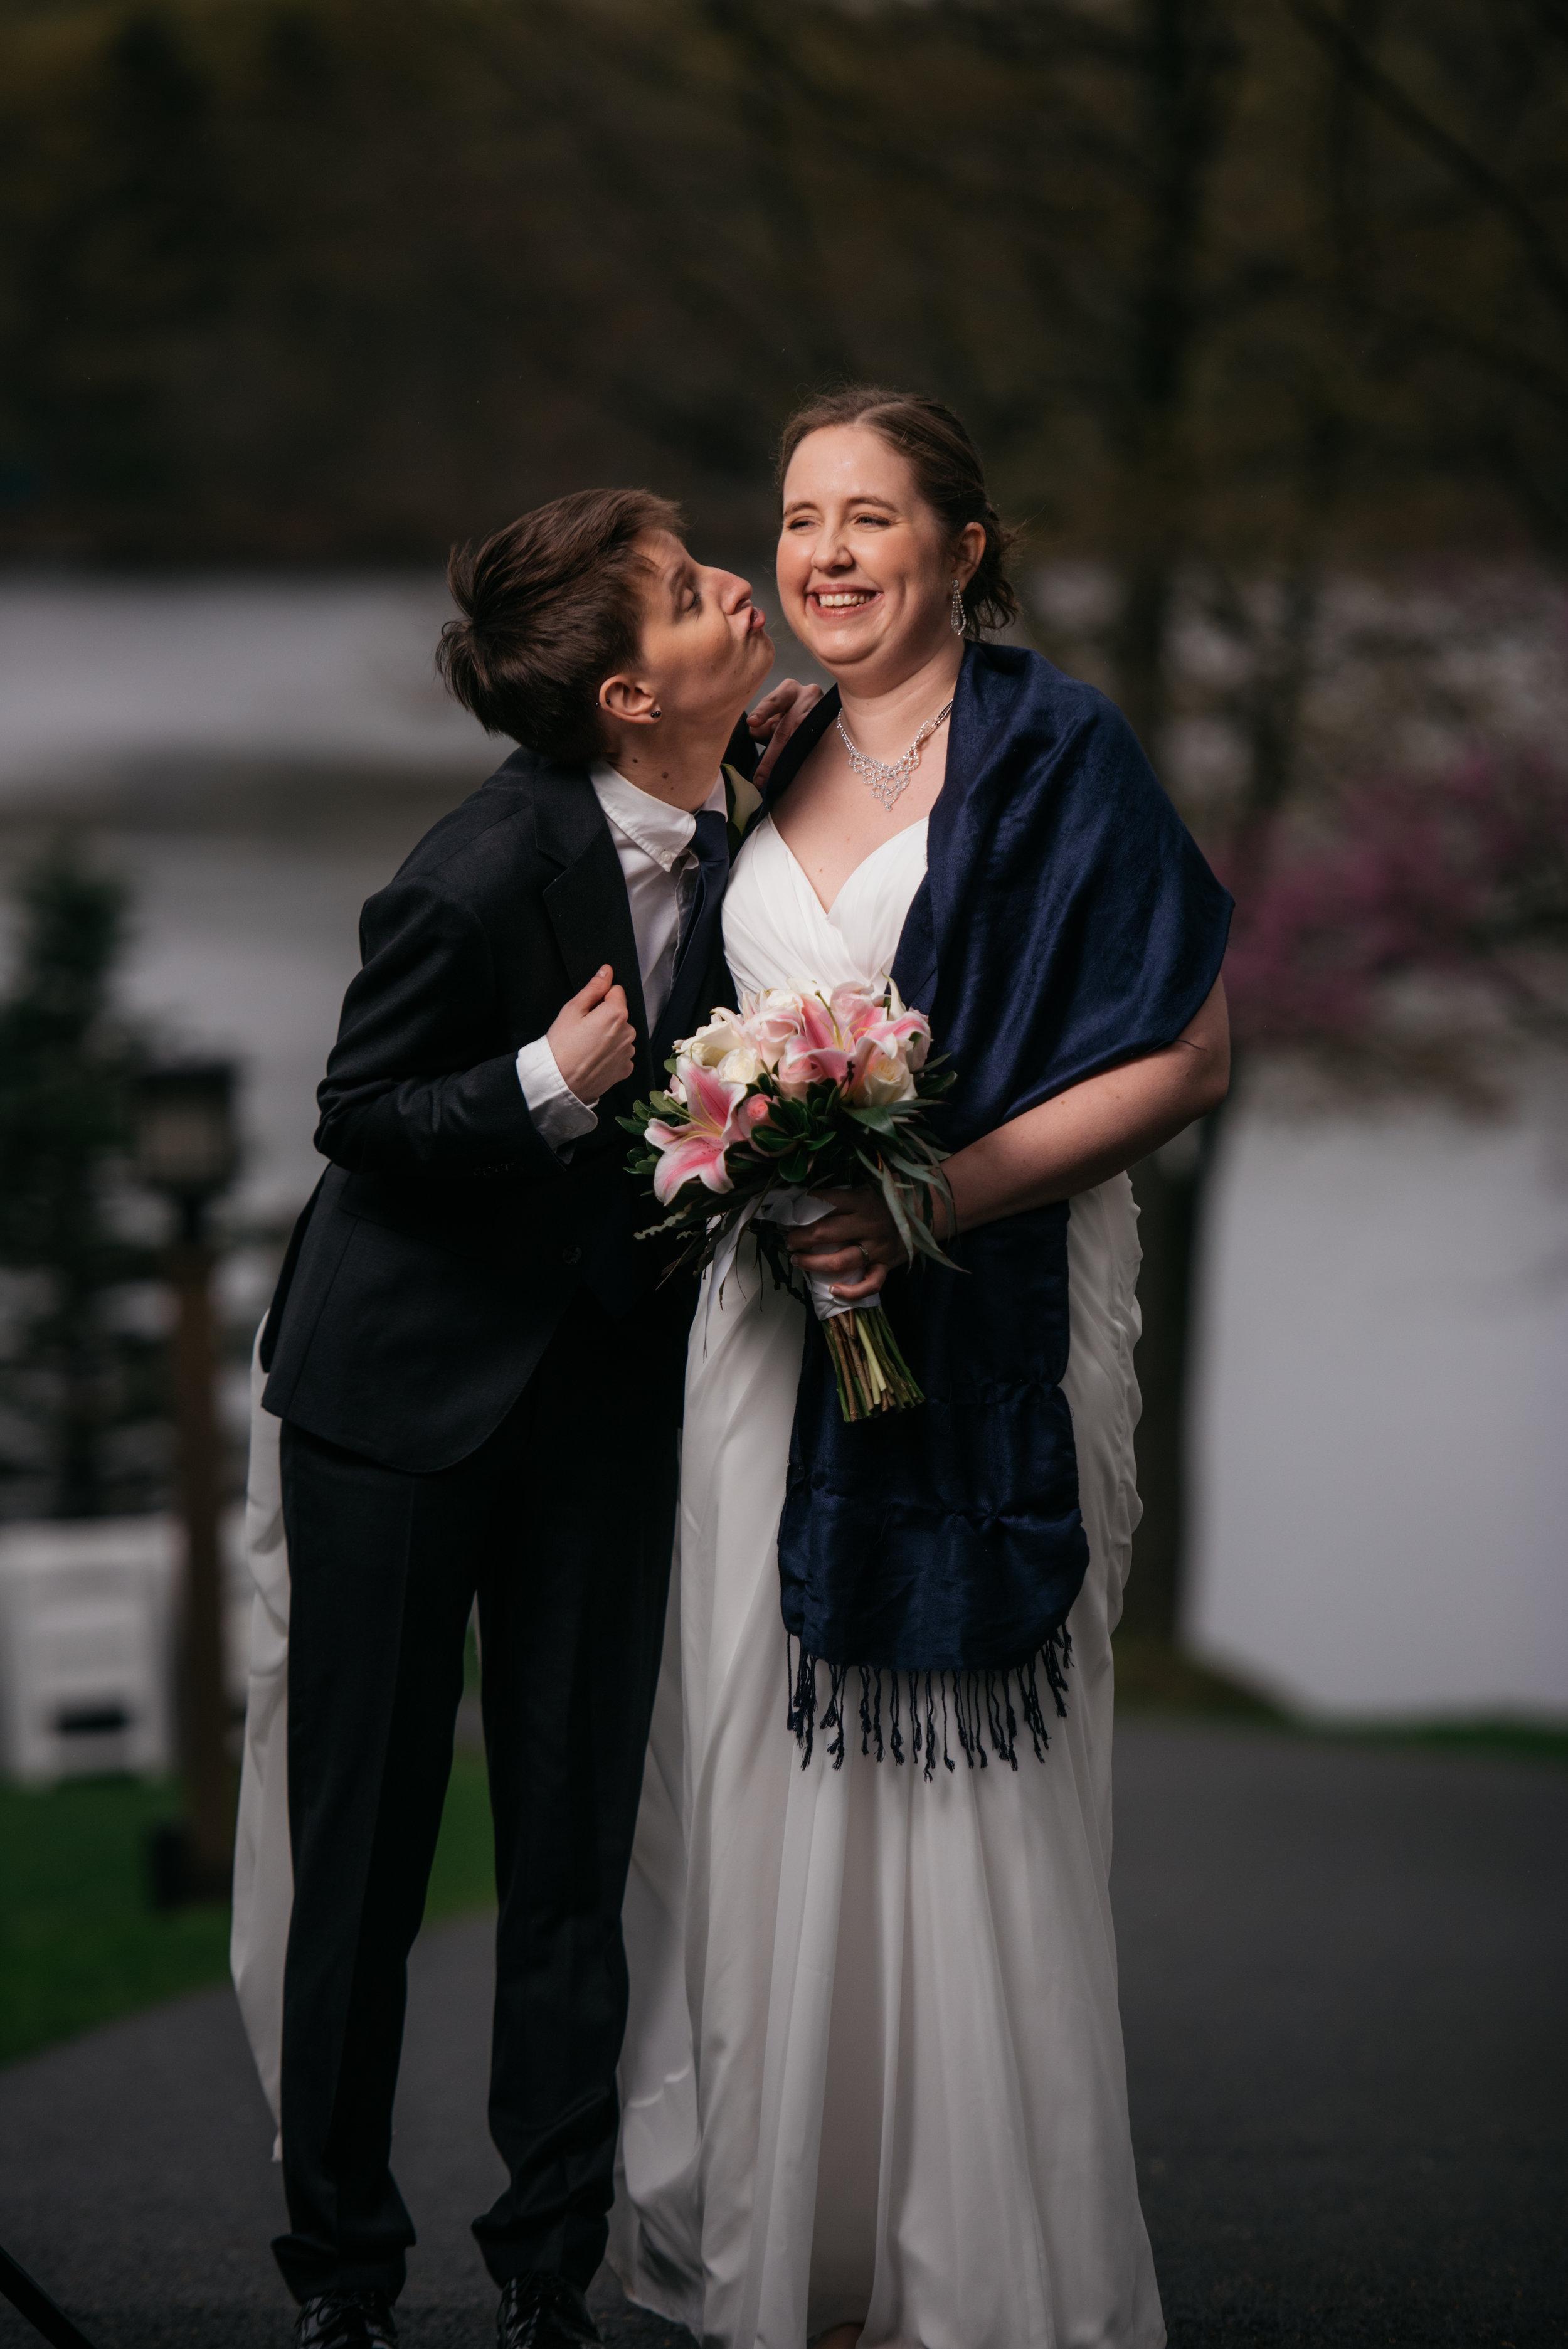 WeddingPhotos | NJPhotographer | Highlights-5.jpg